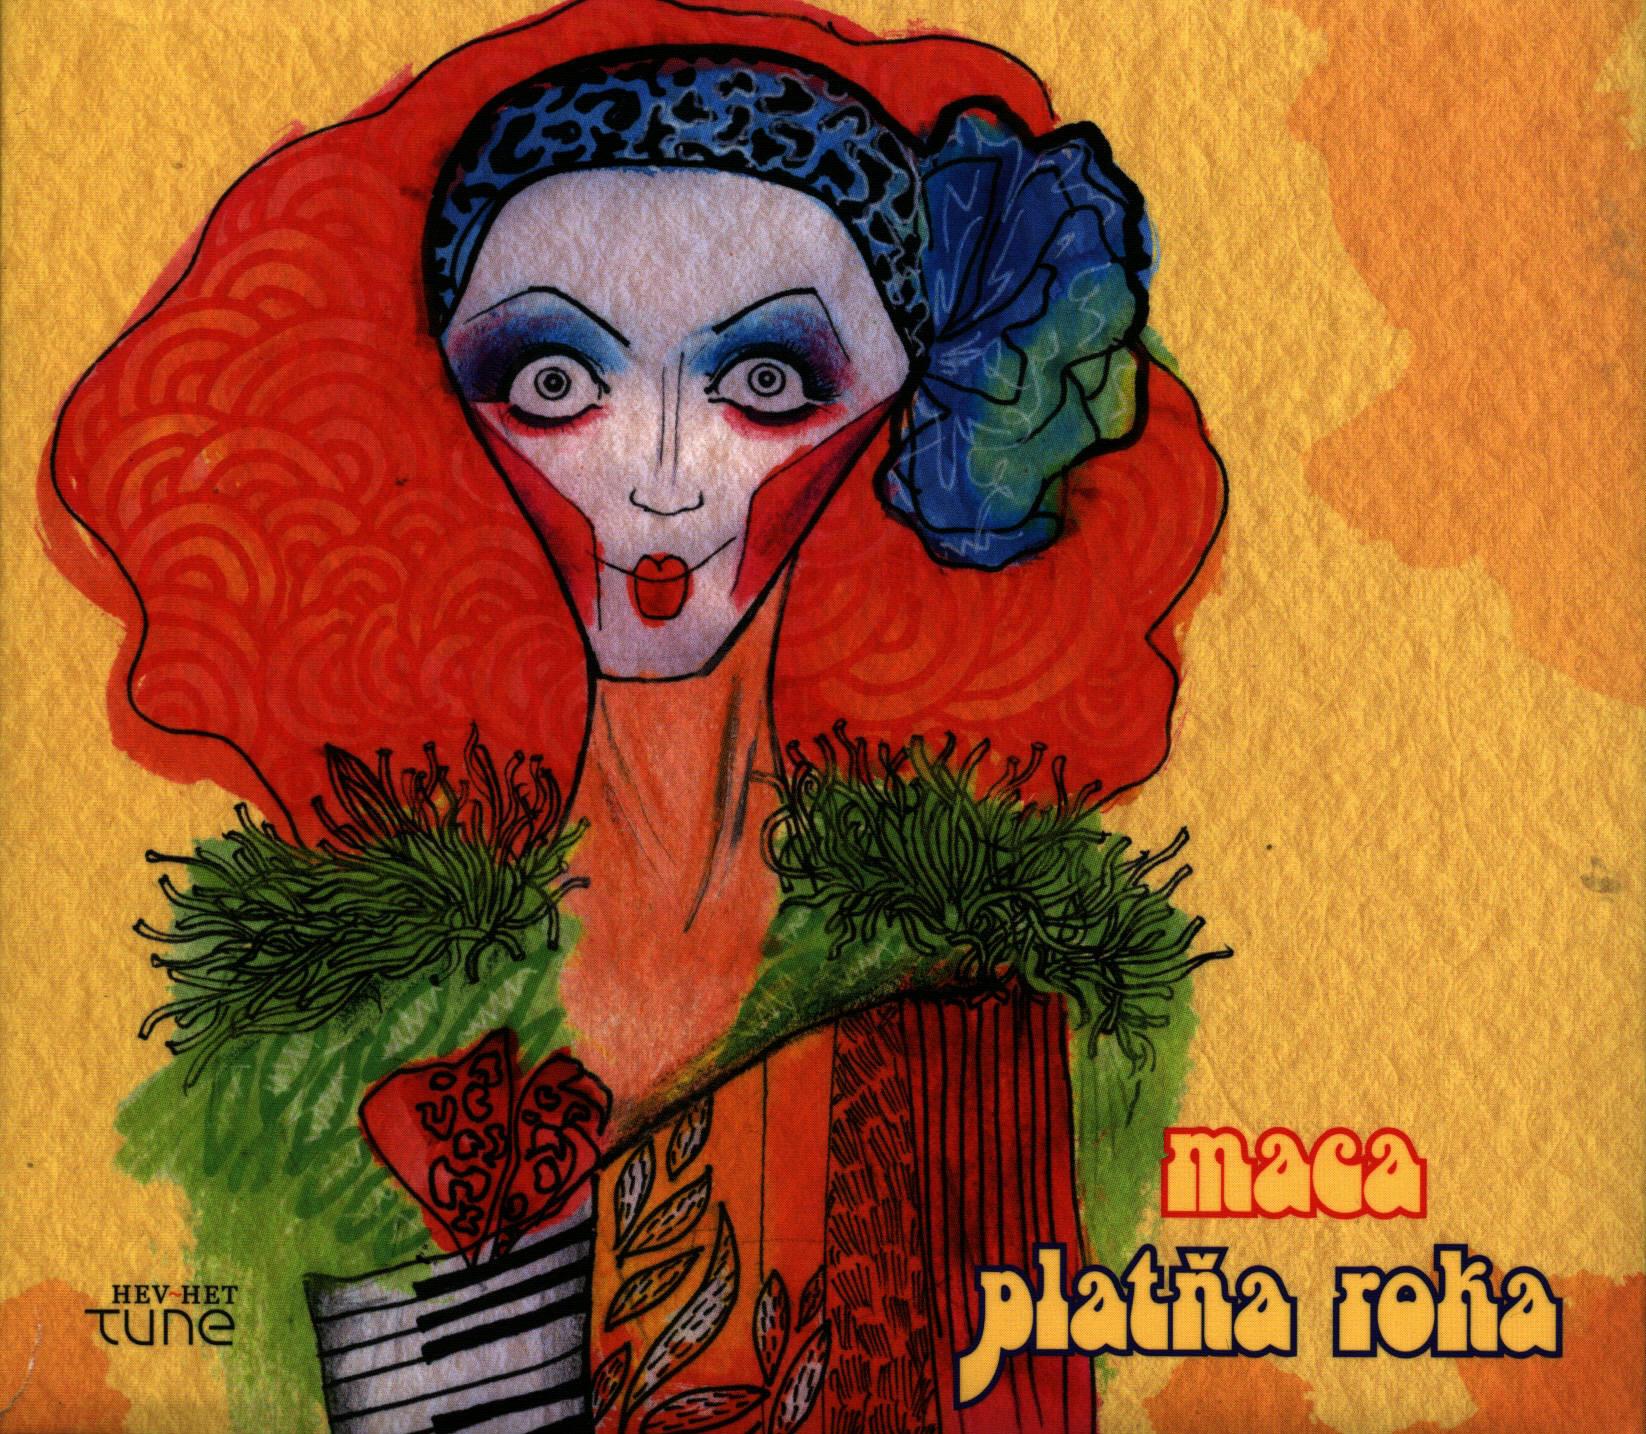 Maca: Platna Roka 【予約受付中】